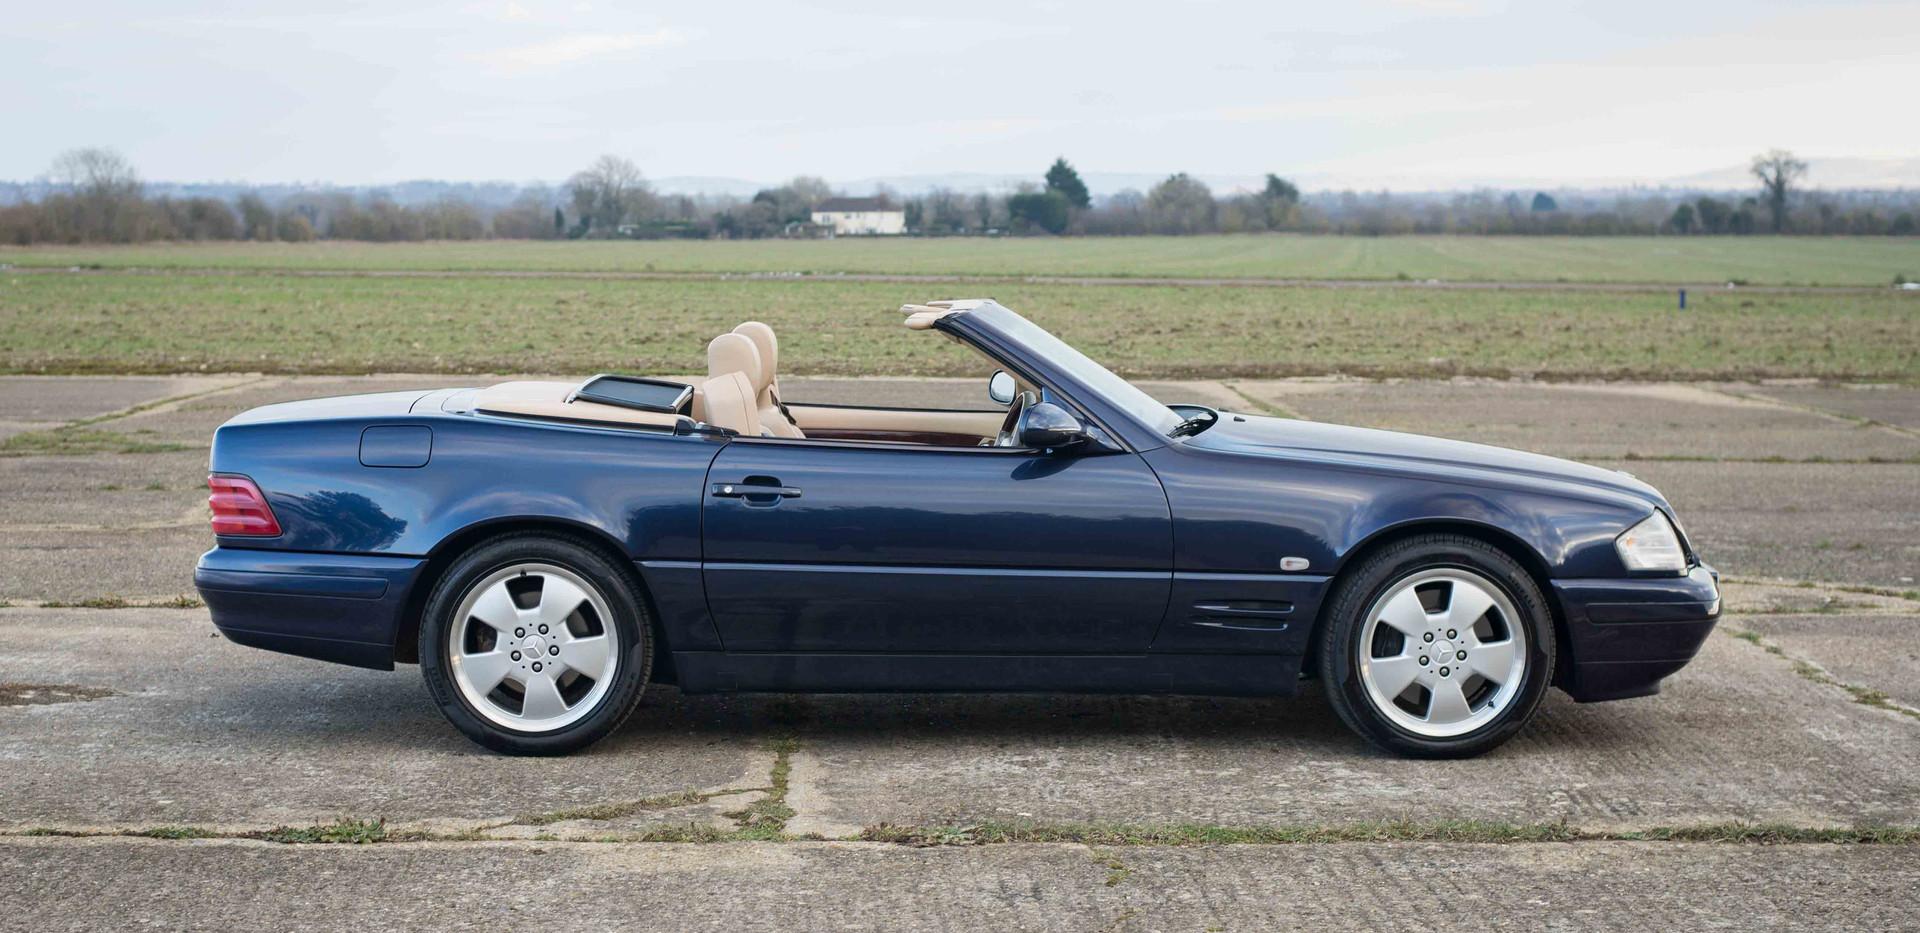 SL500 For Sale UK London  (7 of 36).jpg